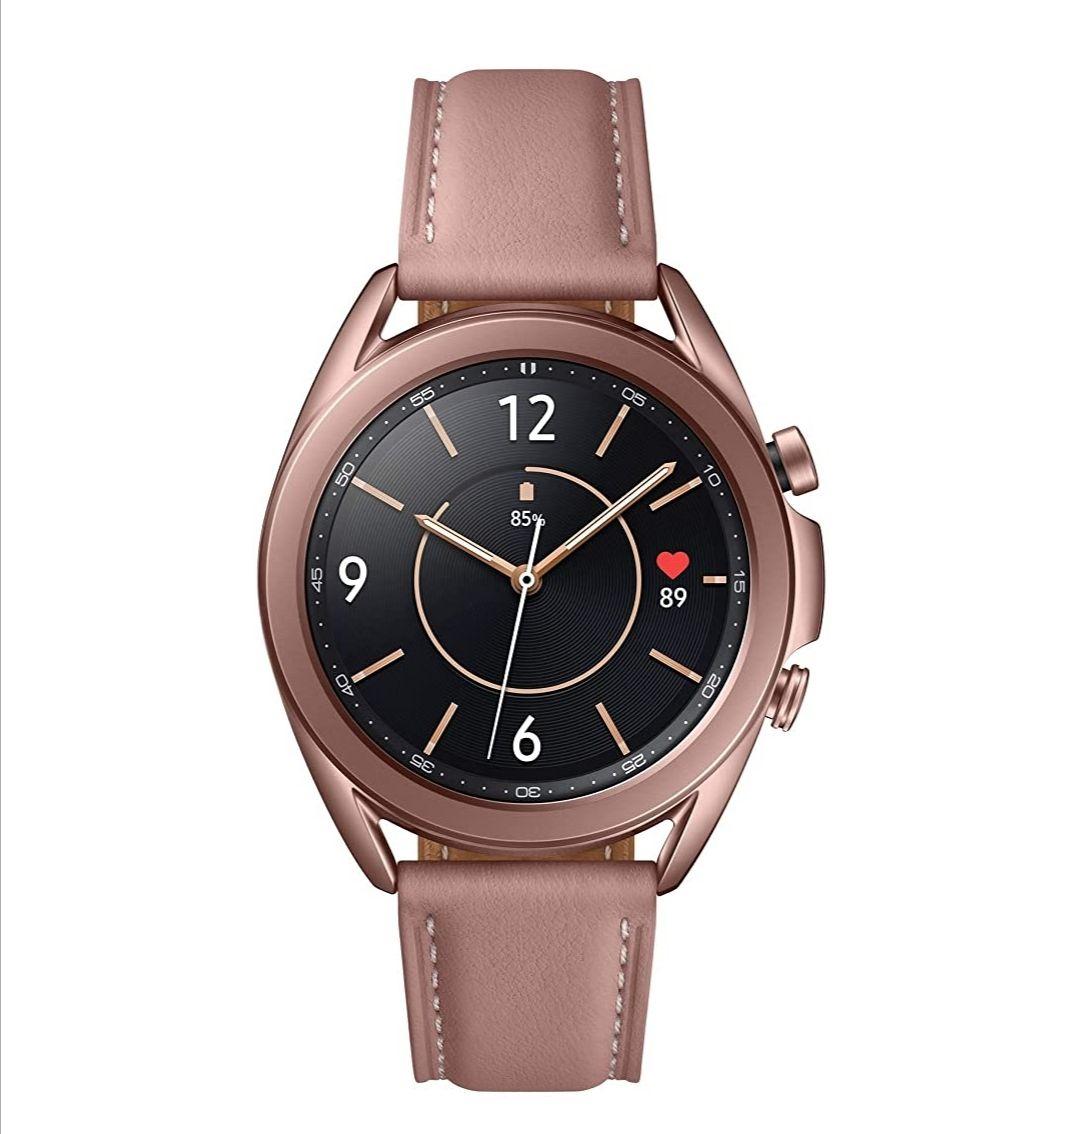 New Samsung Galaxy Watch3 Stainless Steel 41 mm Bluetooth Smart Watch Mystic Bronze (UK Version) - £223.80 @ Amazon